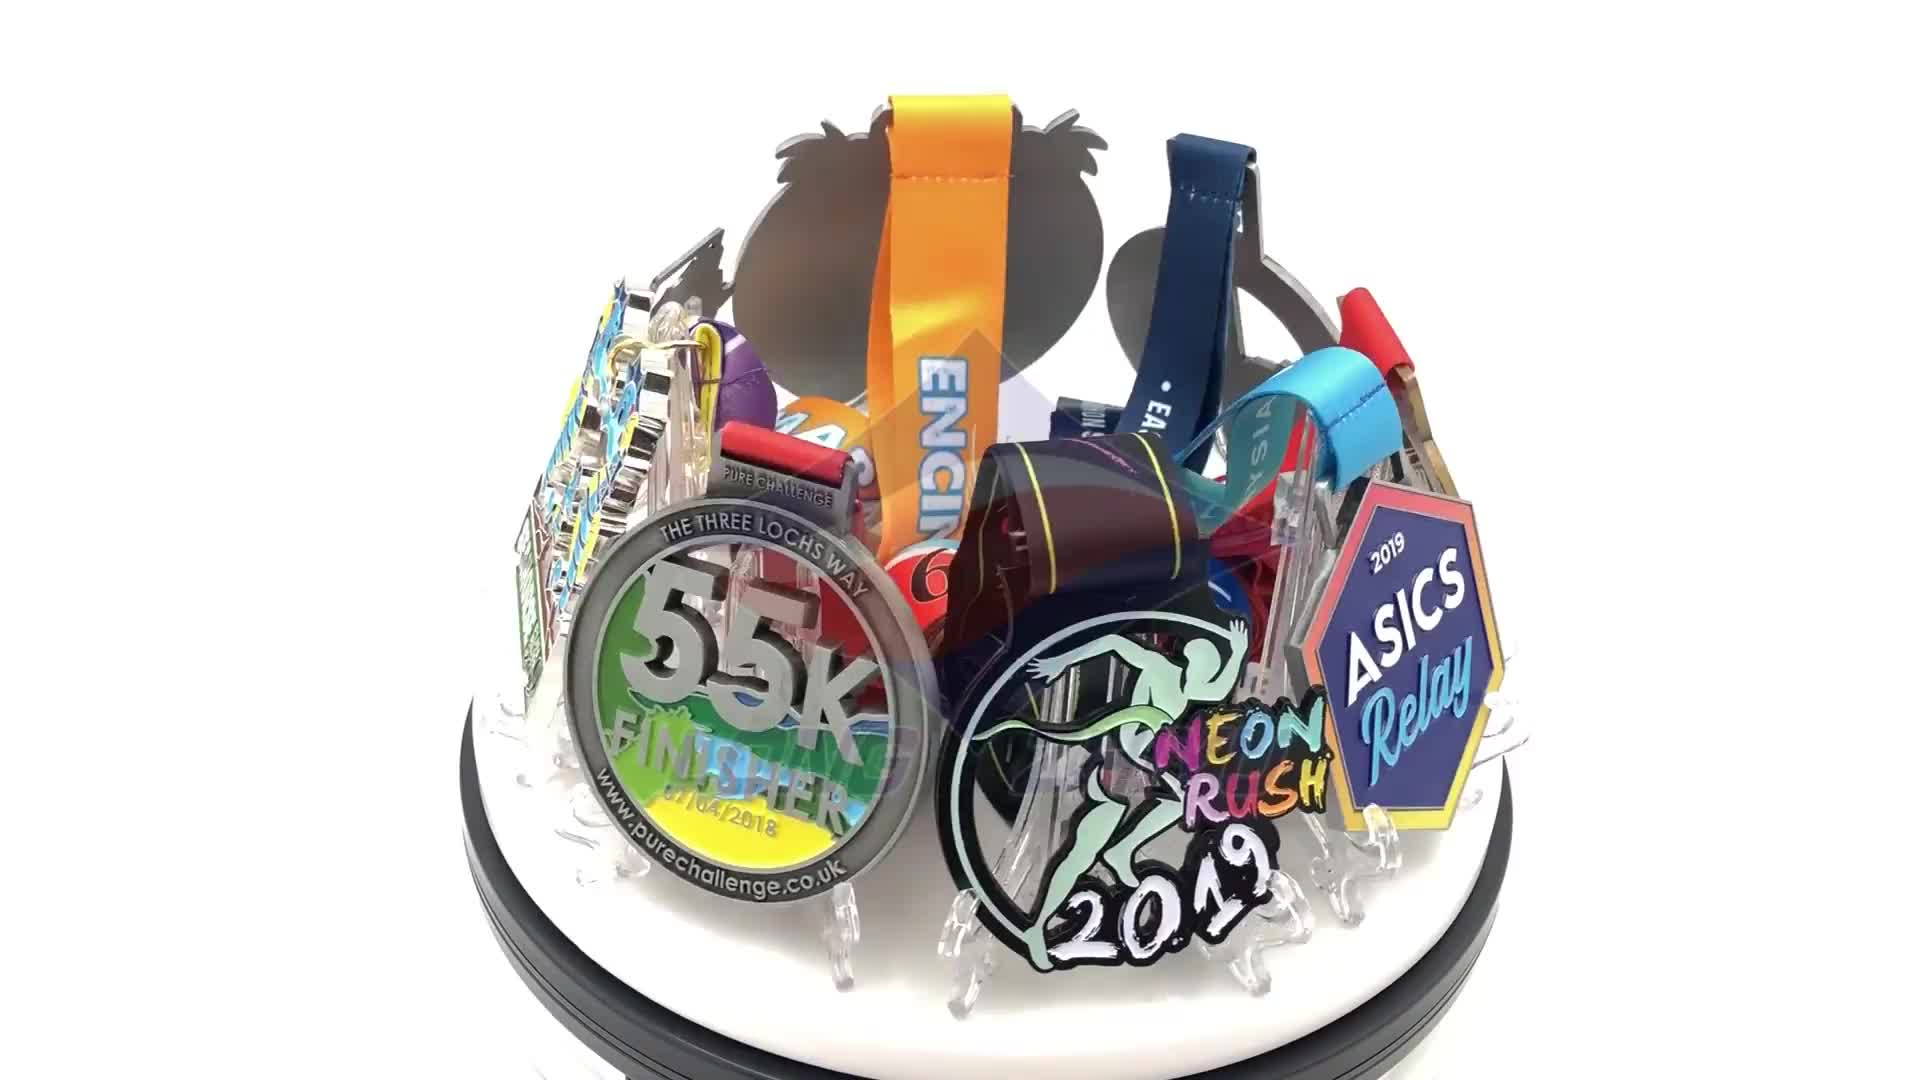 Longzhiyu 13 Years China Professional Manufacturer Customised Marathon Medals Custom Sport Running Metal Medal Zinc Alloy Medals